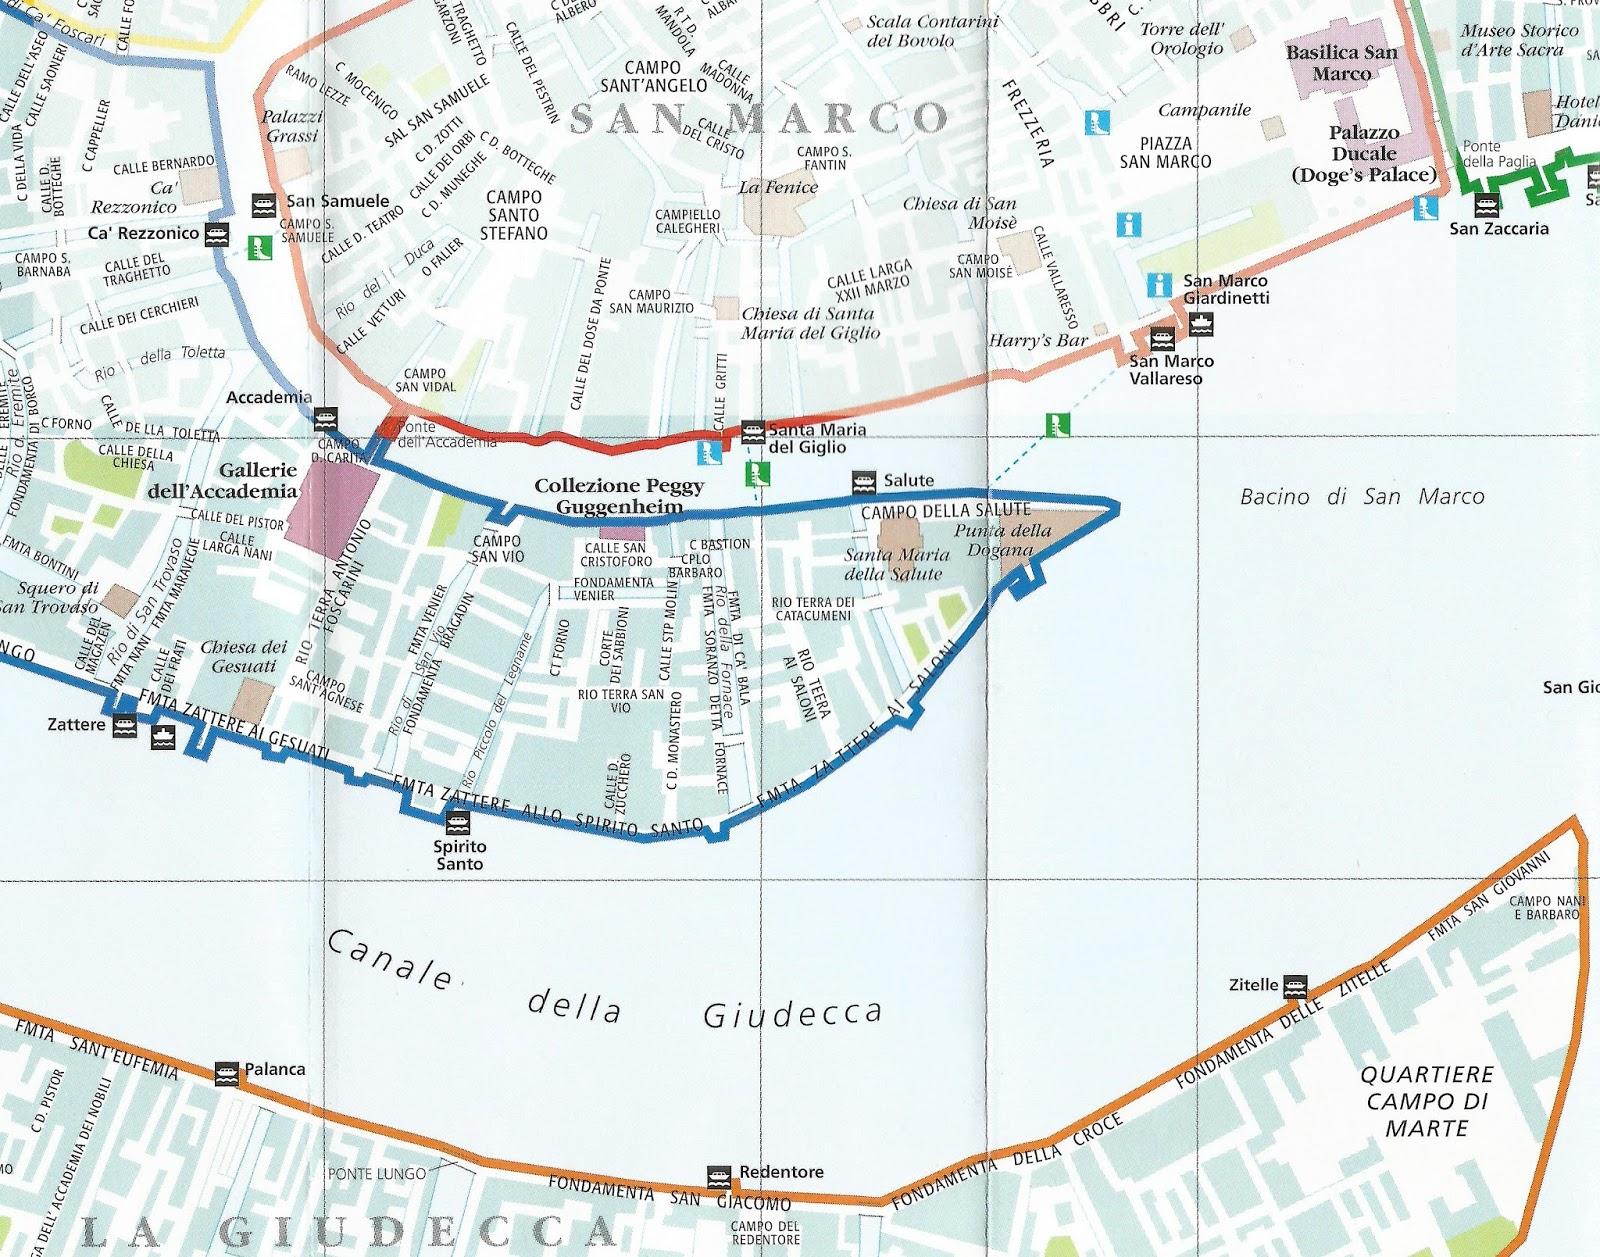 giudecca island venice map - photo#14